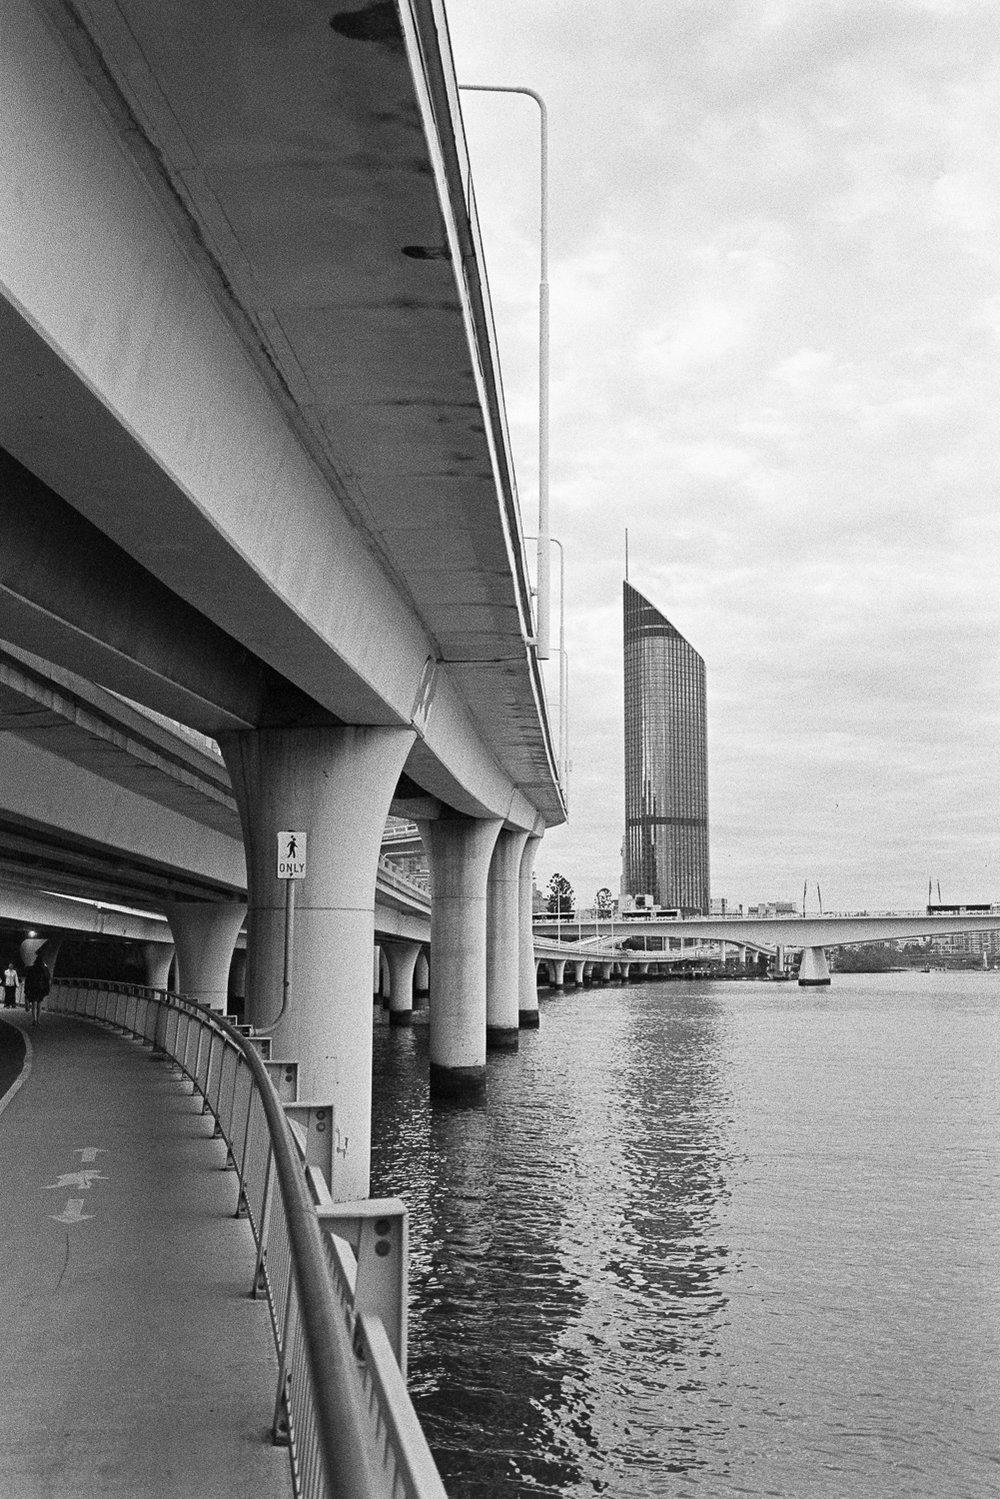 20170710 - Roll 144 - 020-Nick-Bedford,-Photographer-Black and White, Brisbane, Film, Kodak Tri-X 400, Leica M7, Street Photography, Voigtlander 35mm F1.7 Ultron Asph.jpg